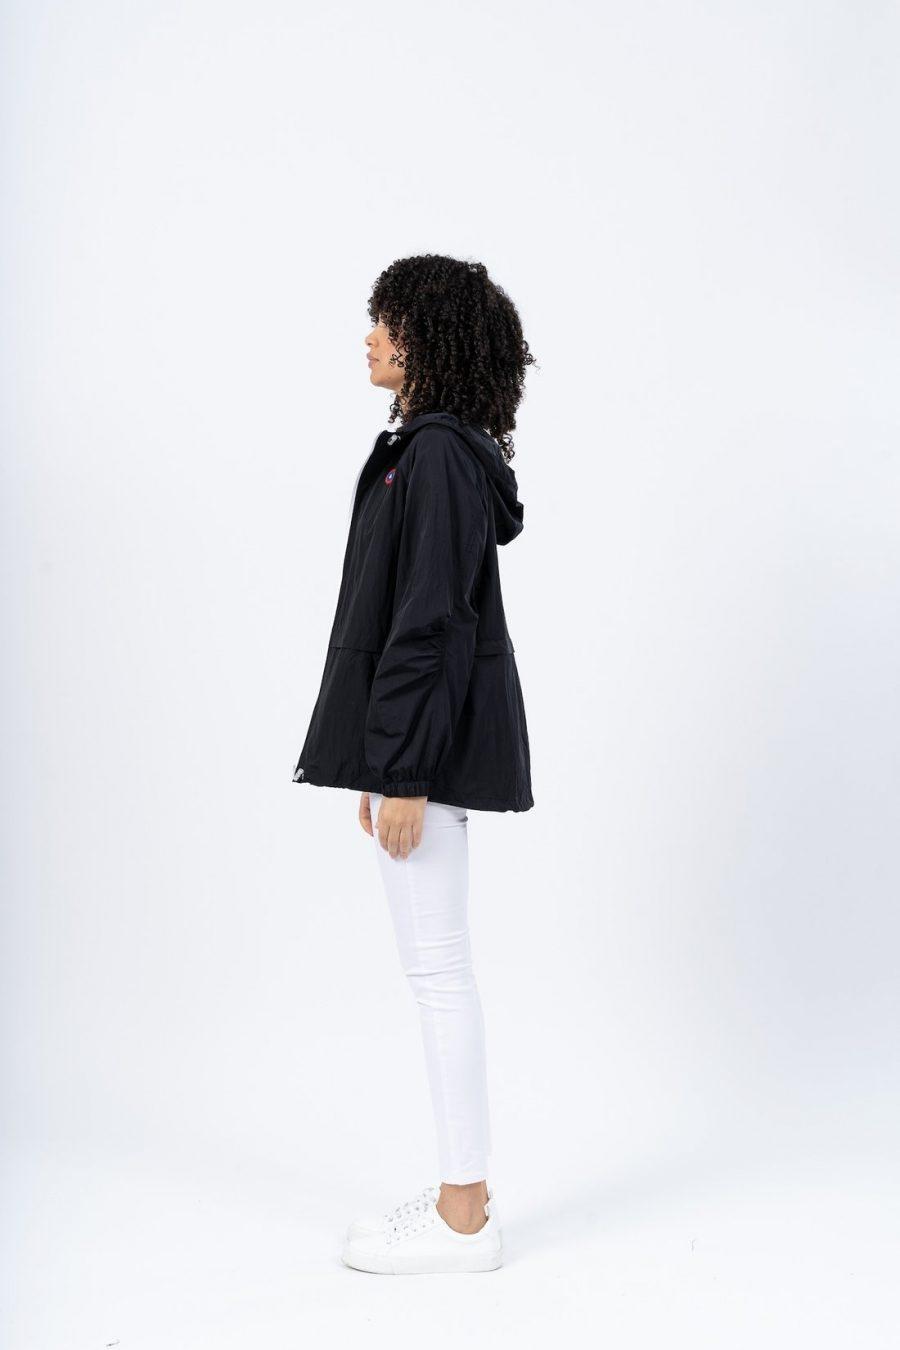 Flotte-Noir-Femme-6_1100x